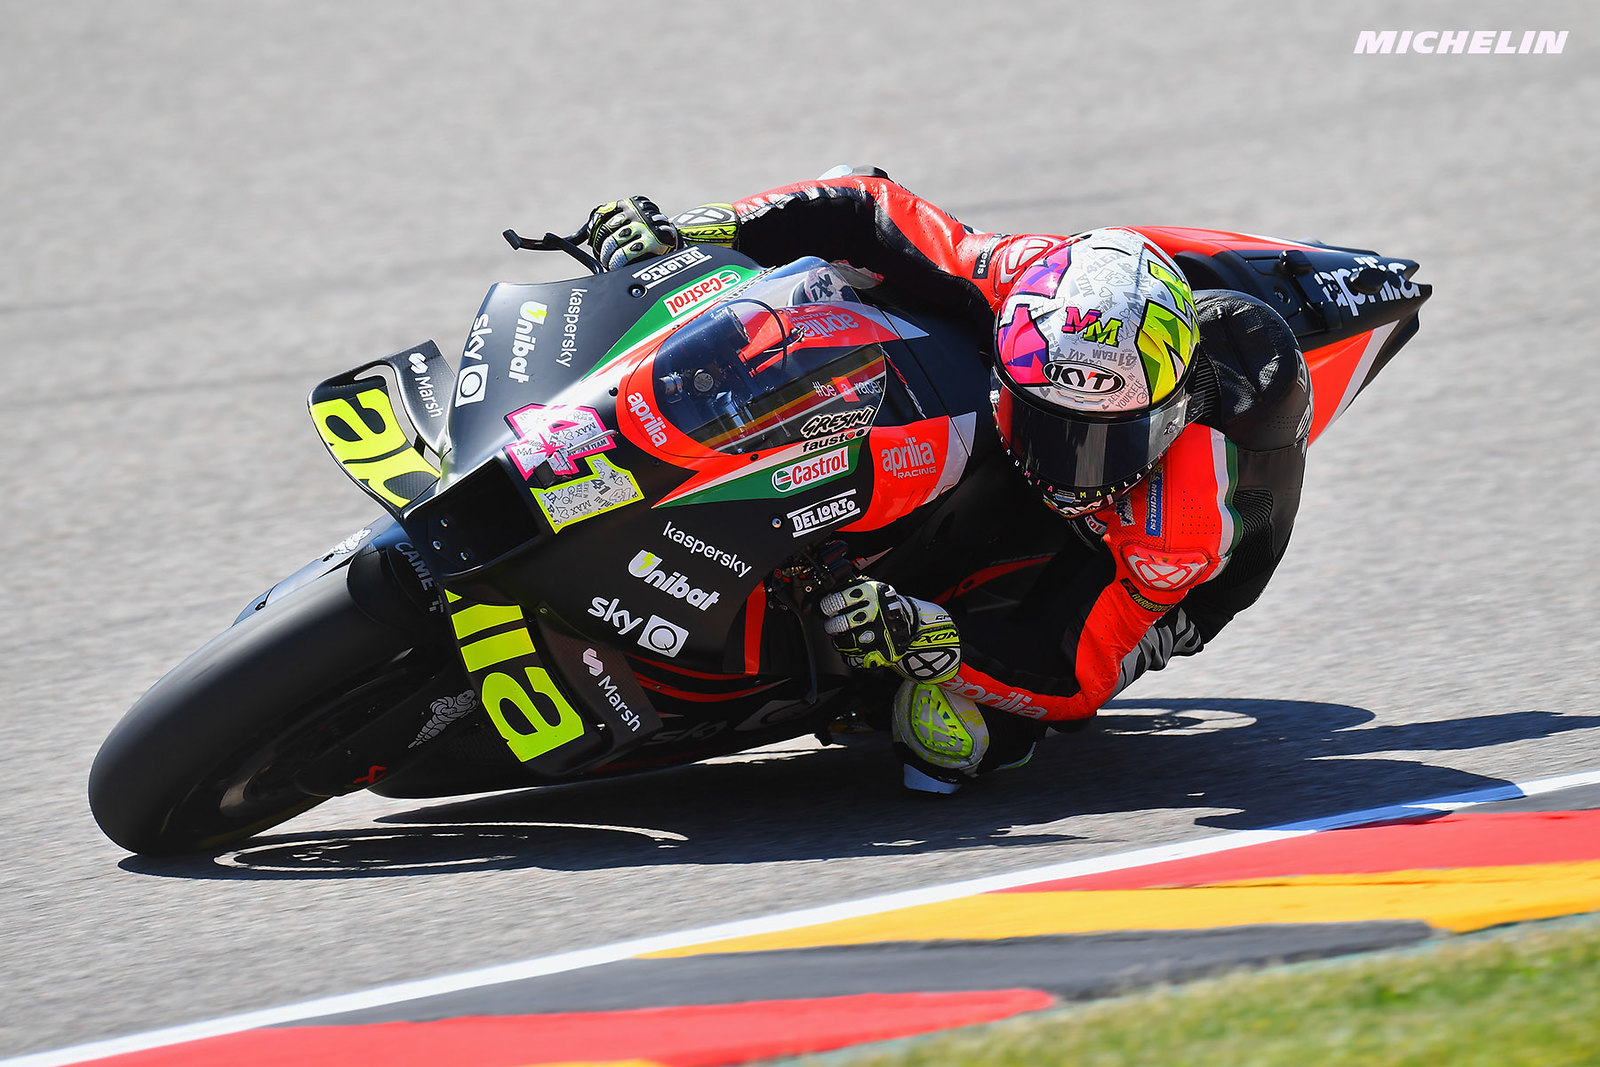 MotoGP2021 ドイツGP 初日総合7位 アレイシ・エスパルガロ「今のところ十分に戦えている」